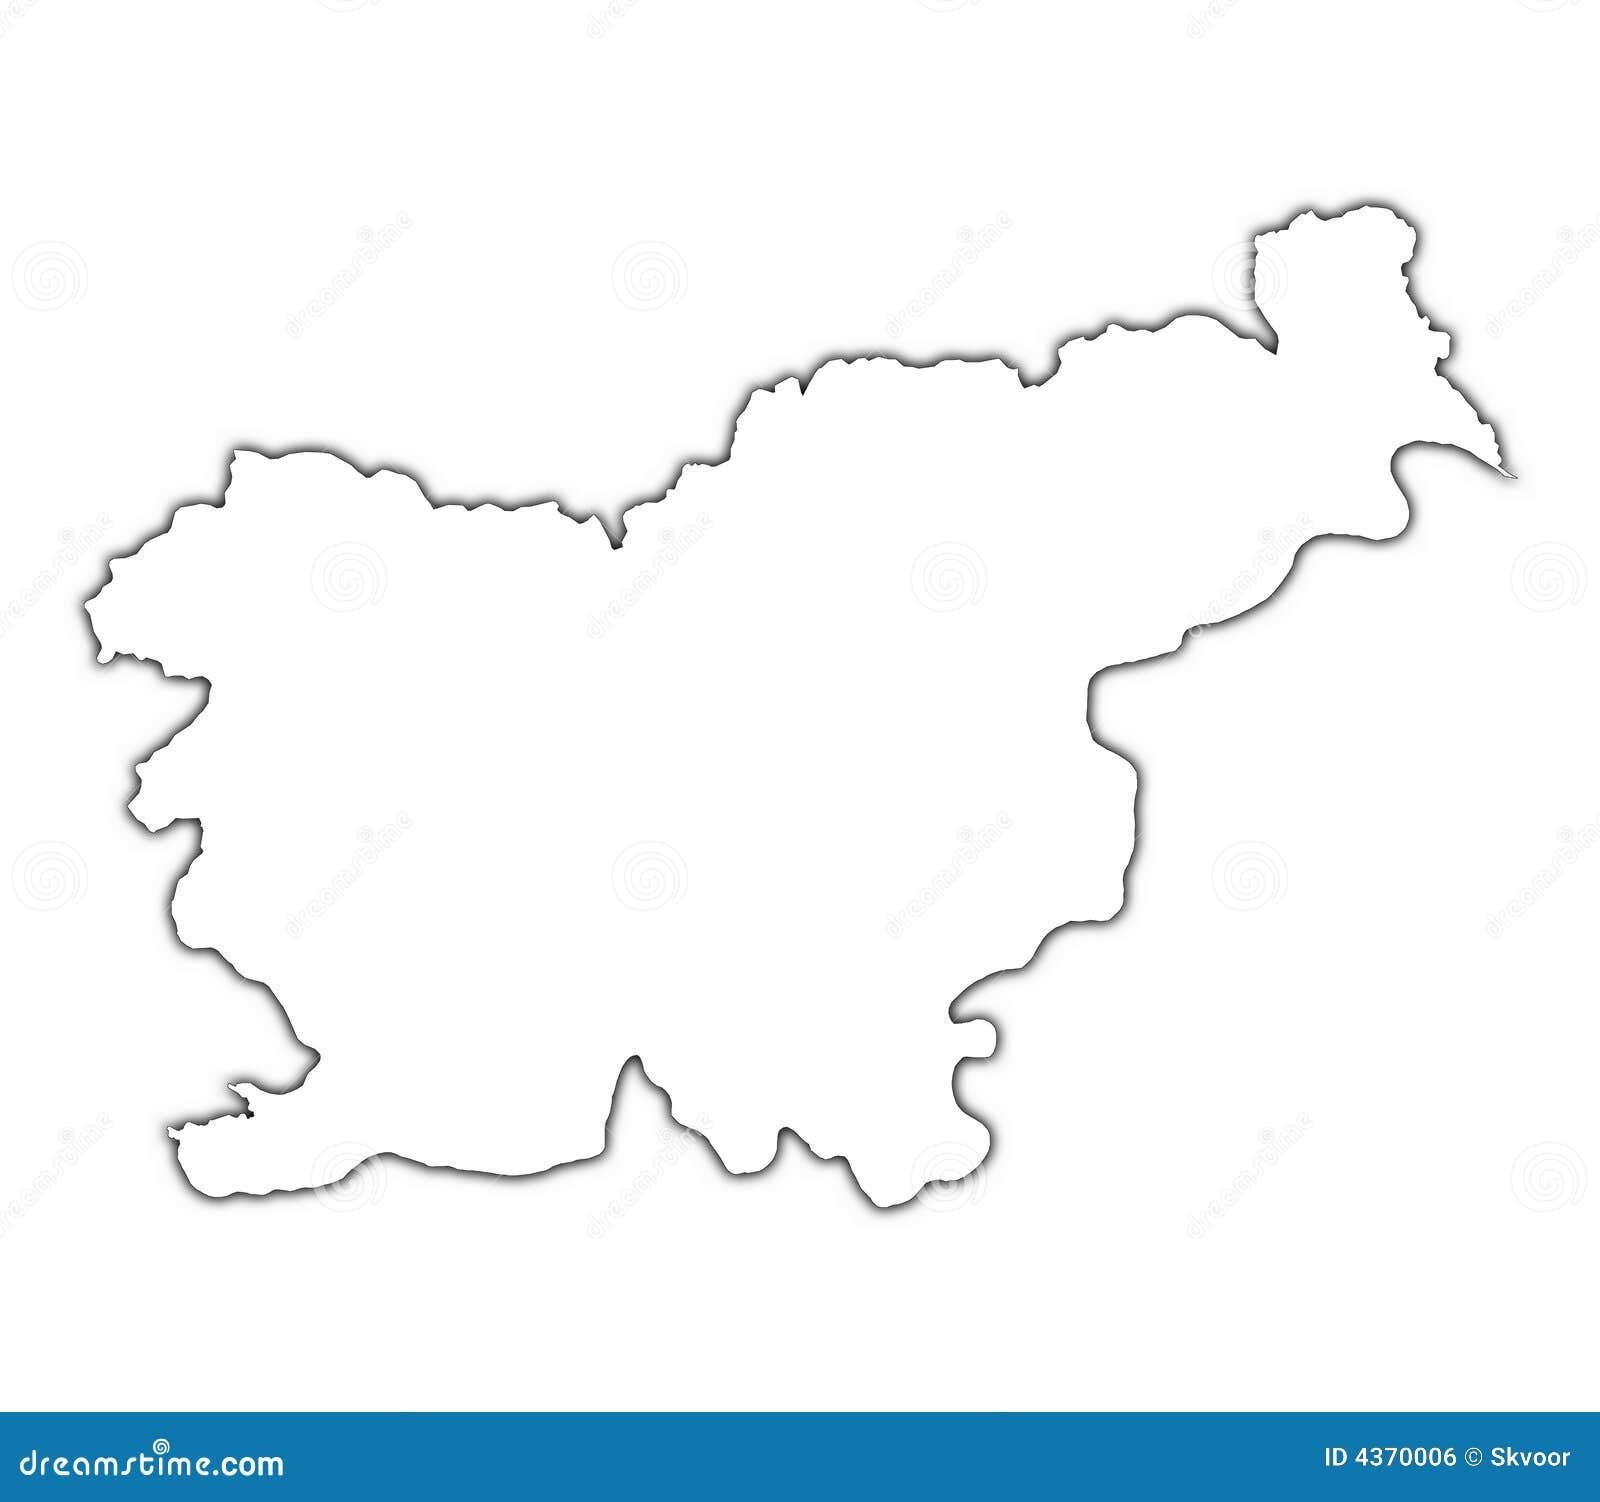 Ukraine Map Outline Slovenia Outline Map R...